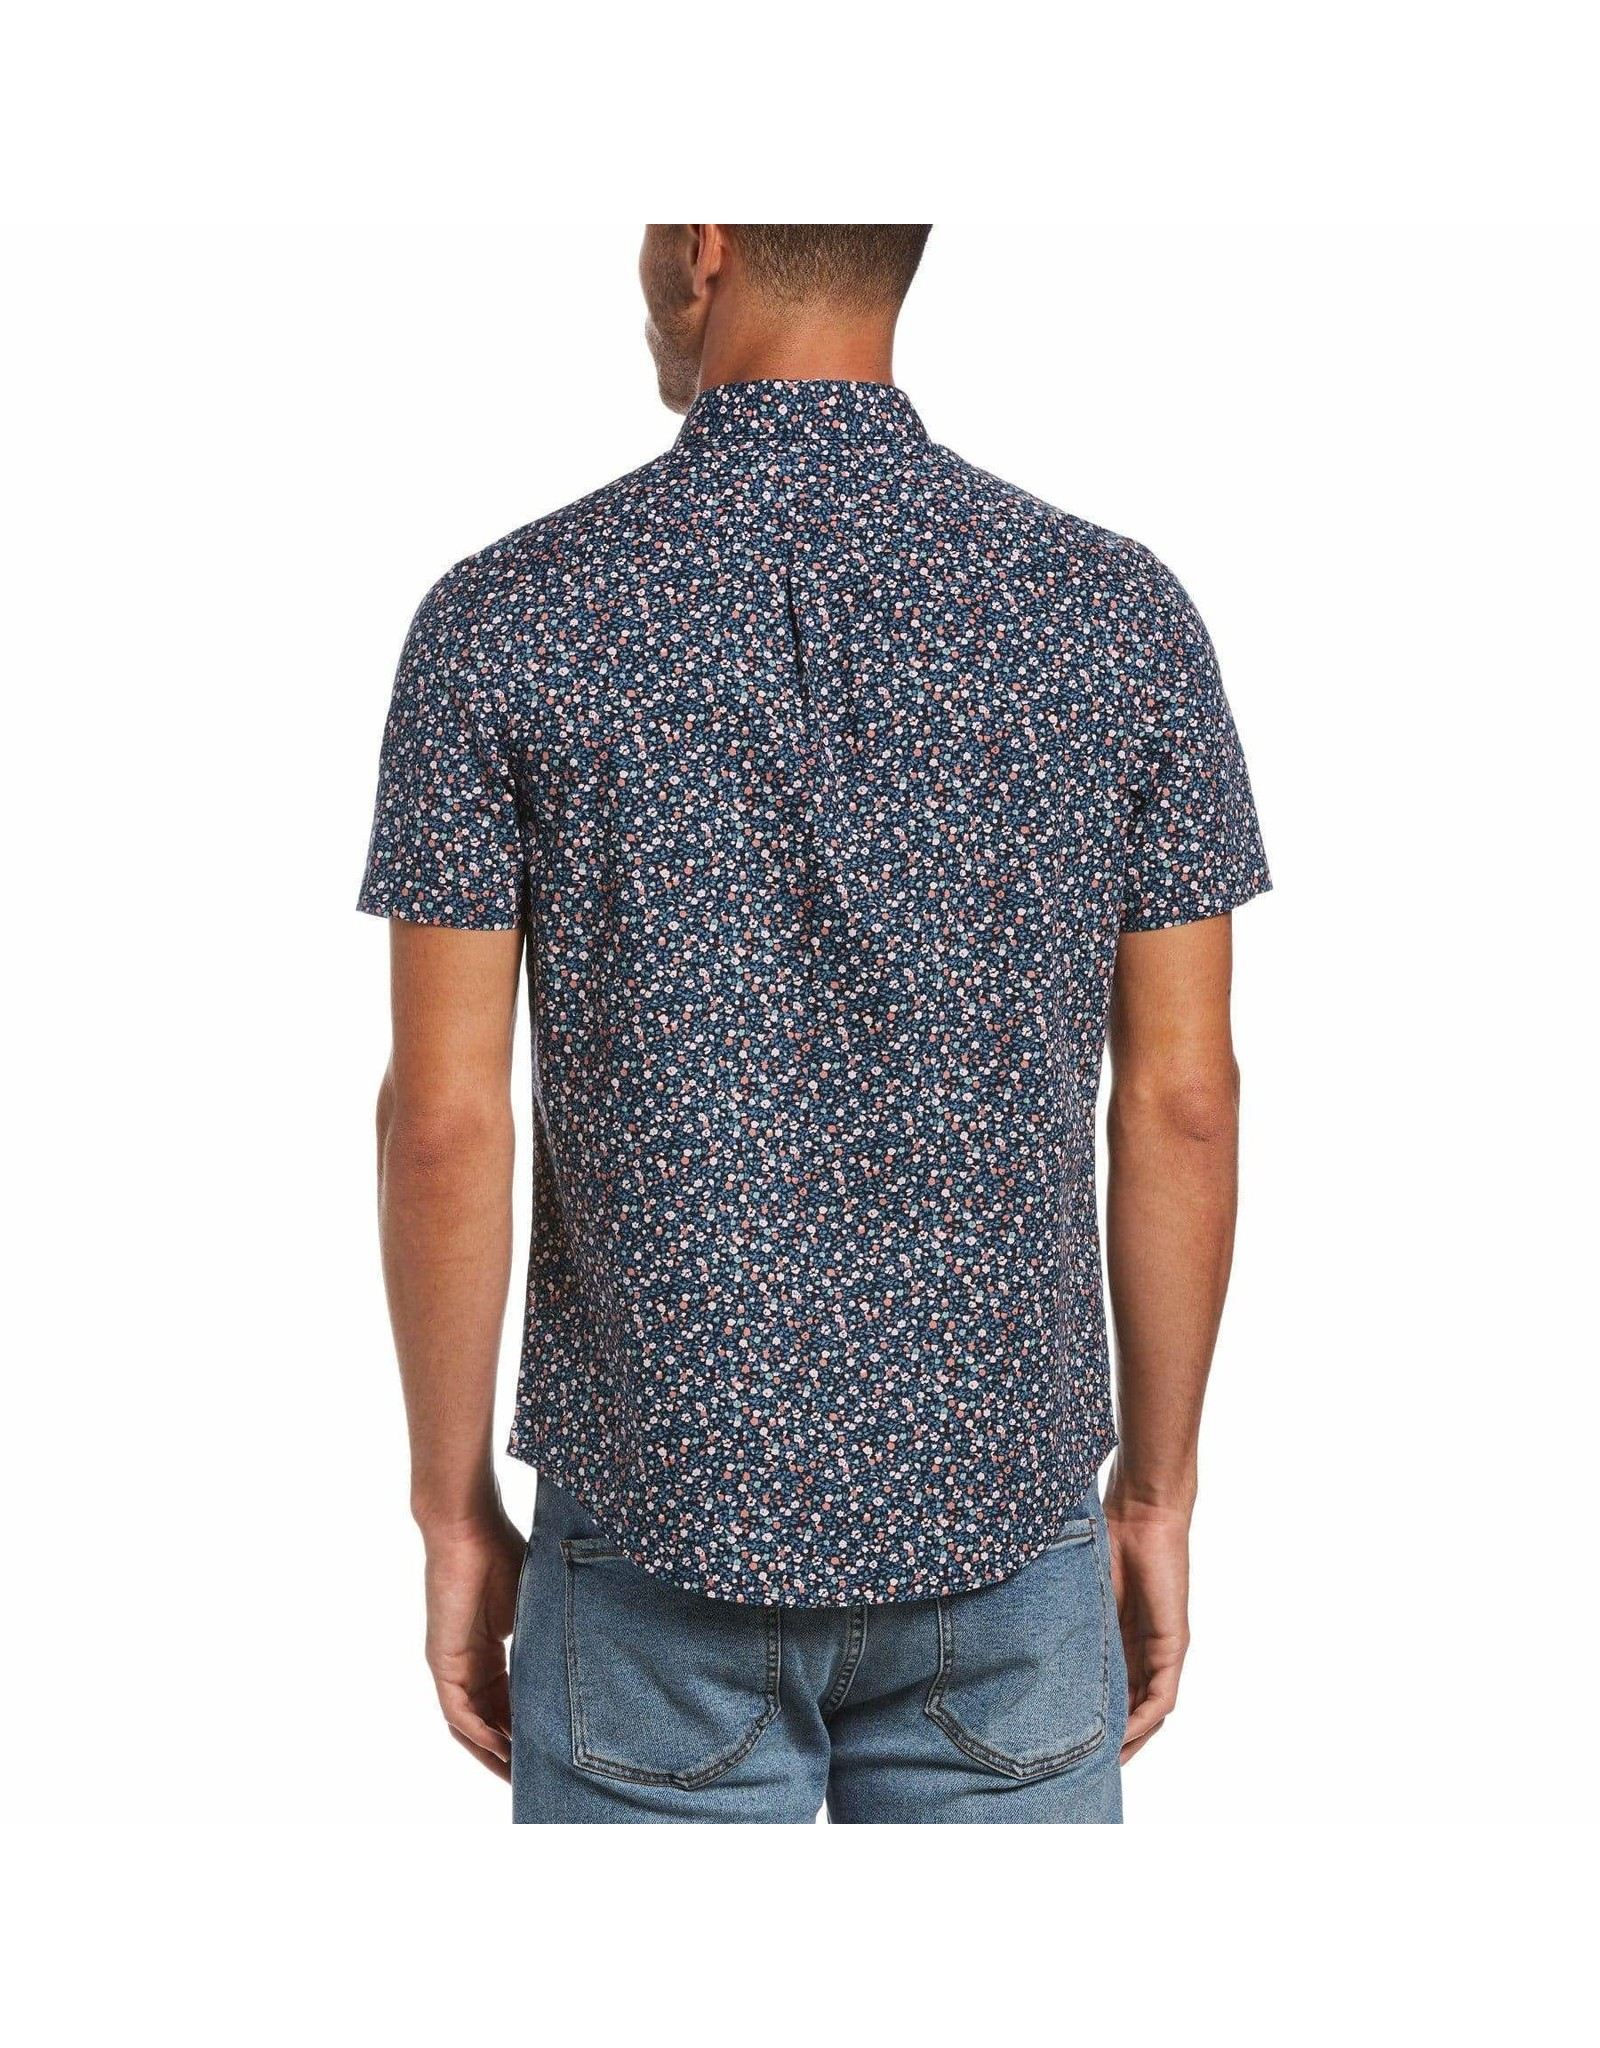 Penguin - Short Sleeve Floral Print Shirt